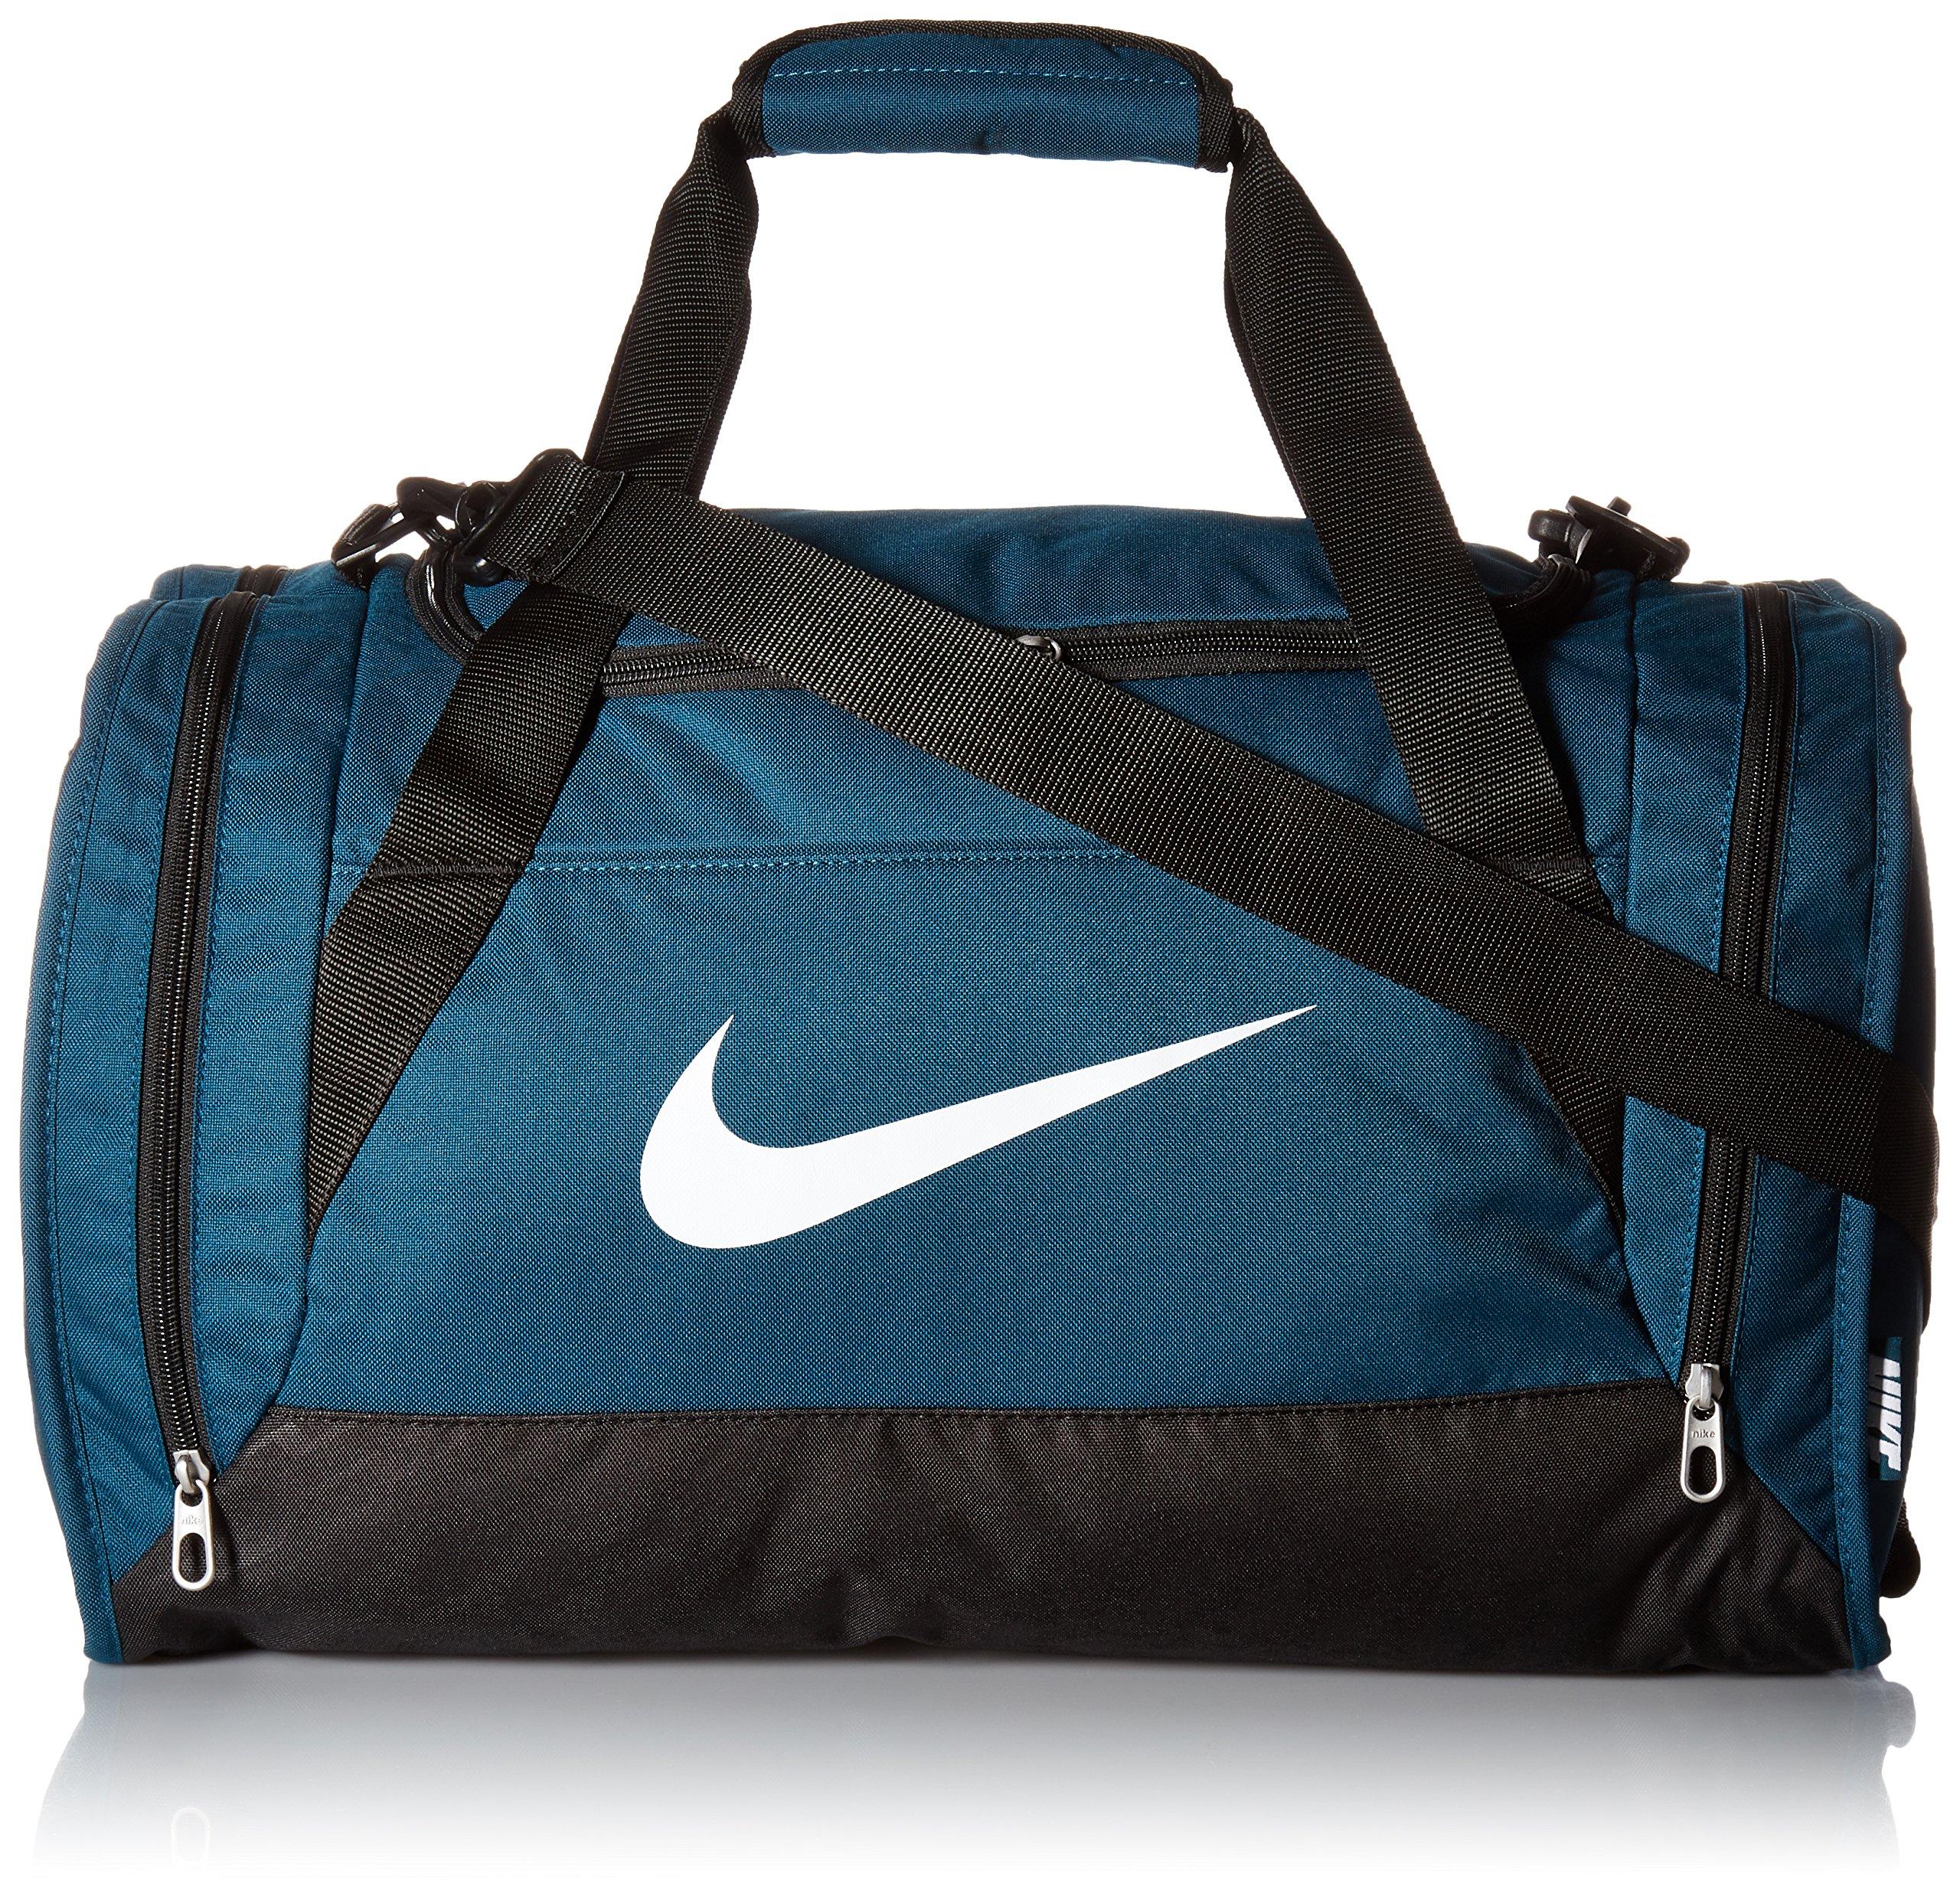 Nike Brasilia 6 Medium Sports Duffel Gym Bag Midnight Turquoise